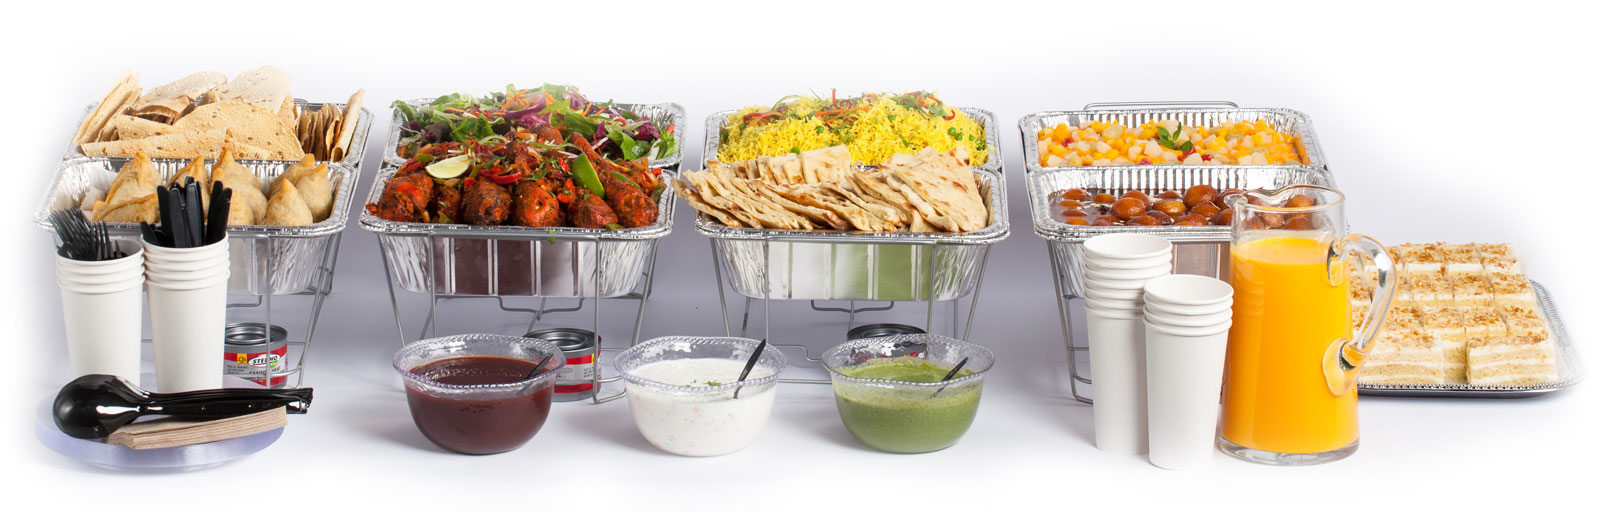 Saffron-Valley-Indian-Food-Catering-SLC.jpg